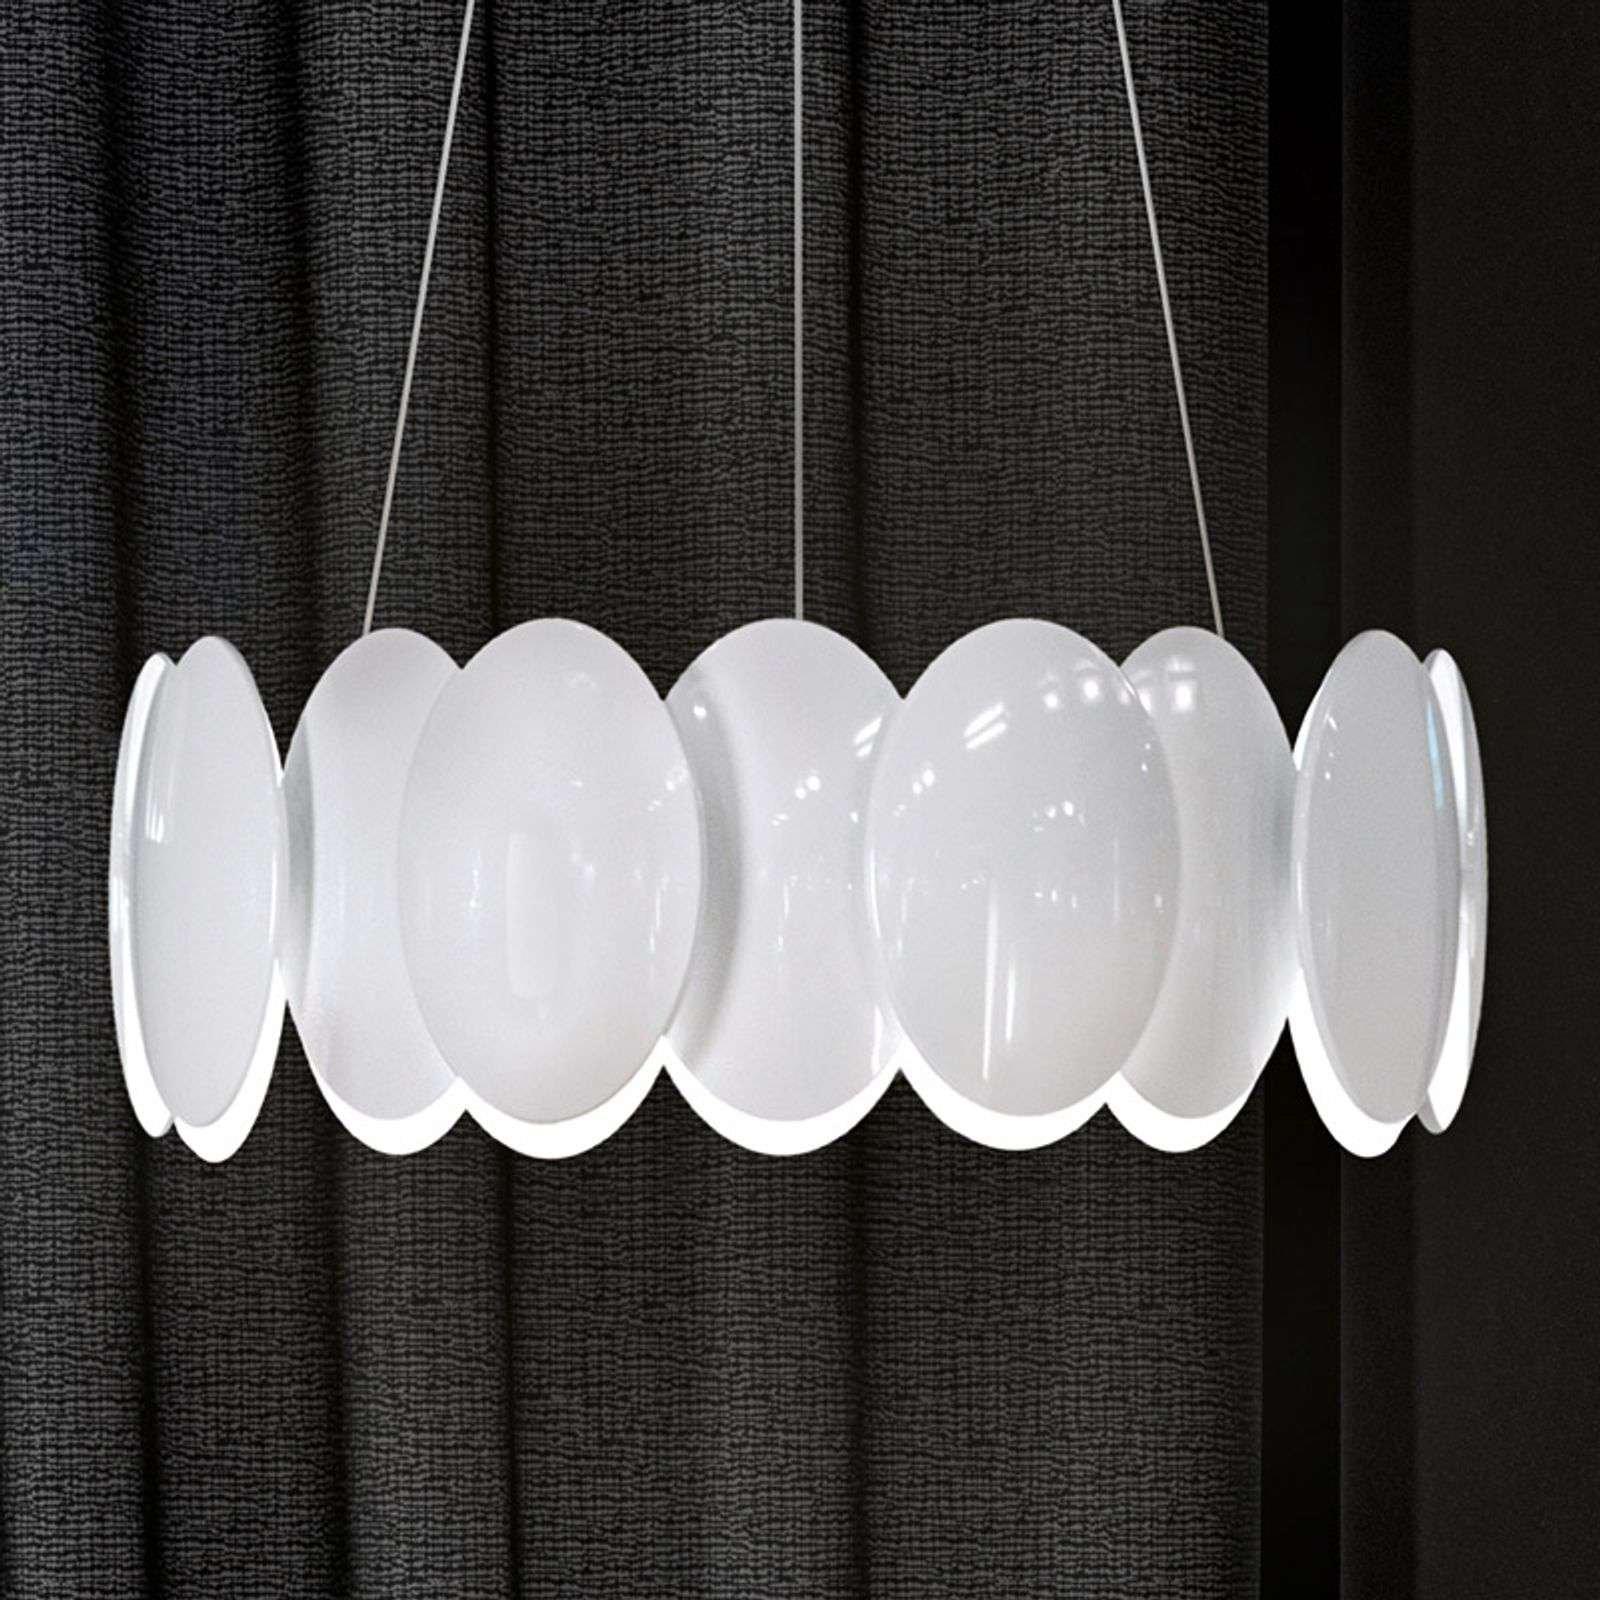 Round LED hanging light Obolo   42 9 cm